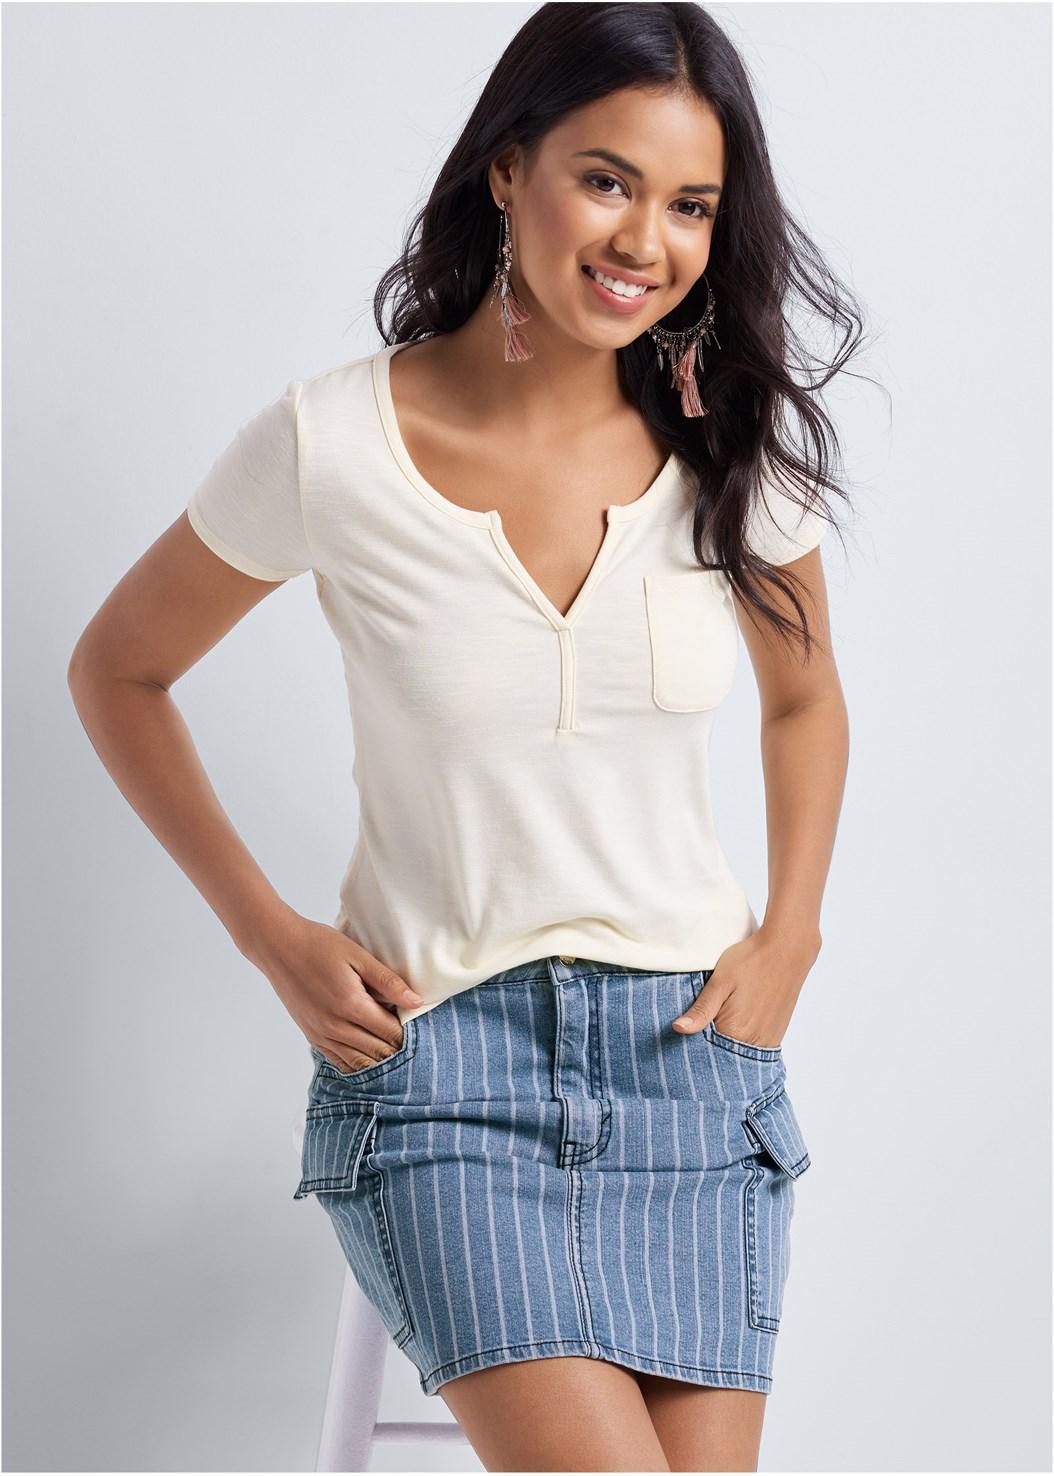 Striped Mini Denim Skirt,Casual Pocket Tee,Embellished Espadrilles